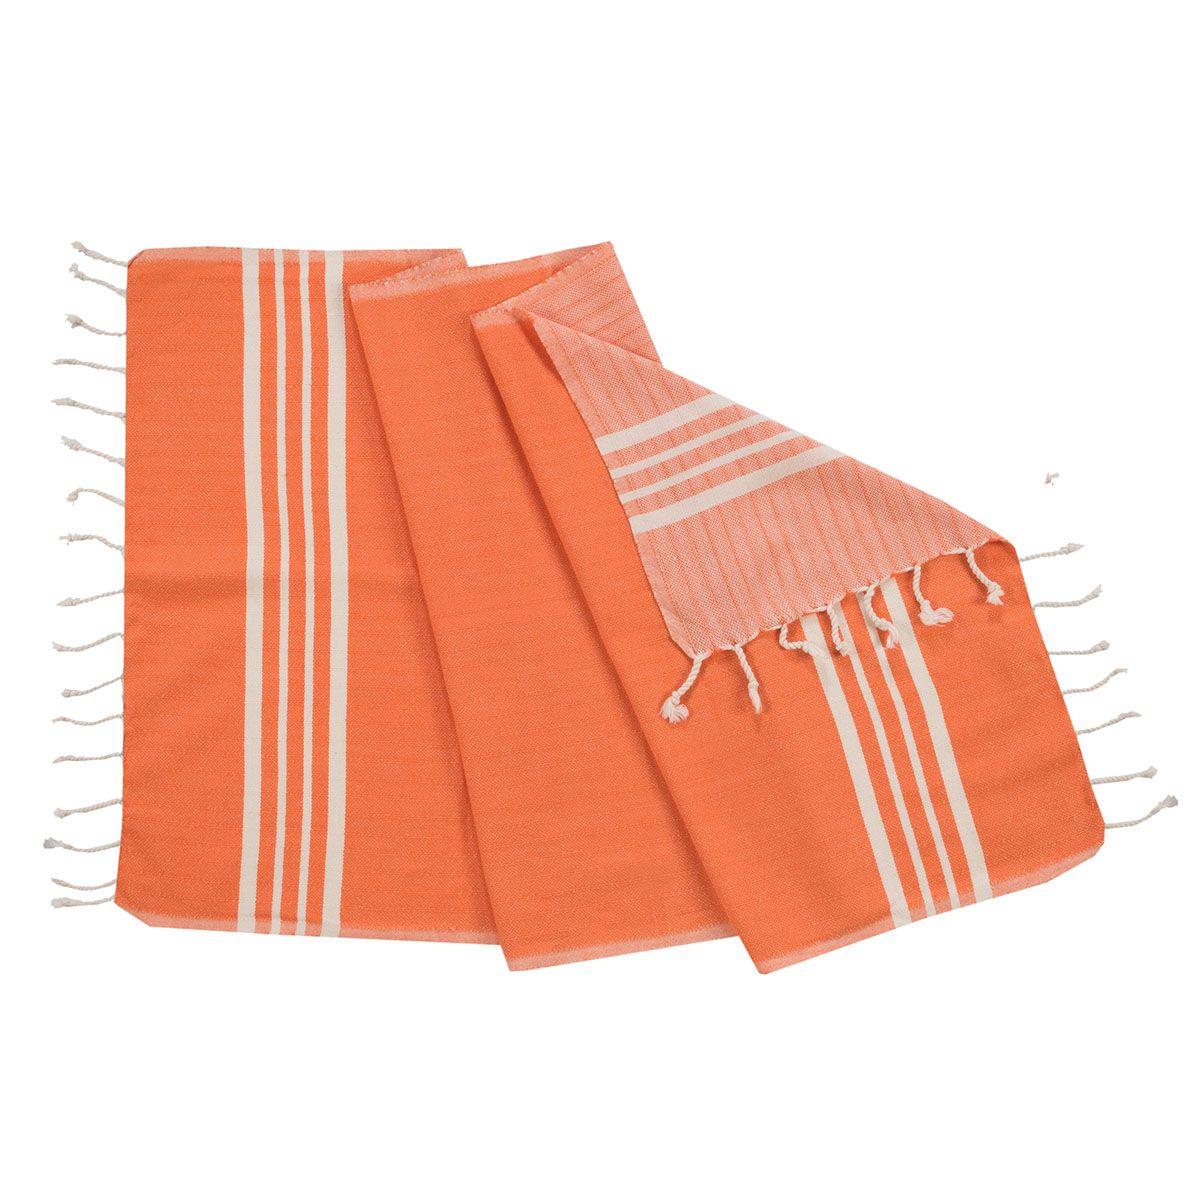 Peshkir Sultan - Orange